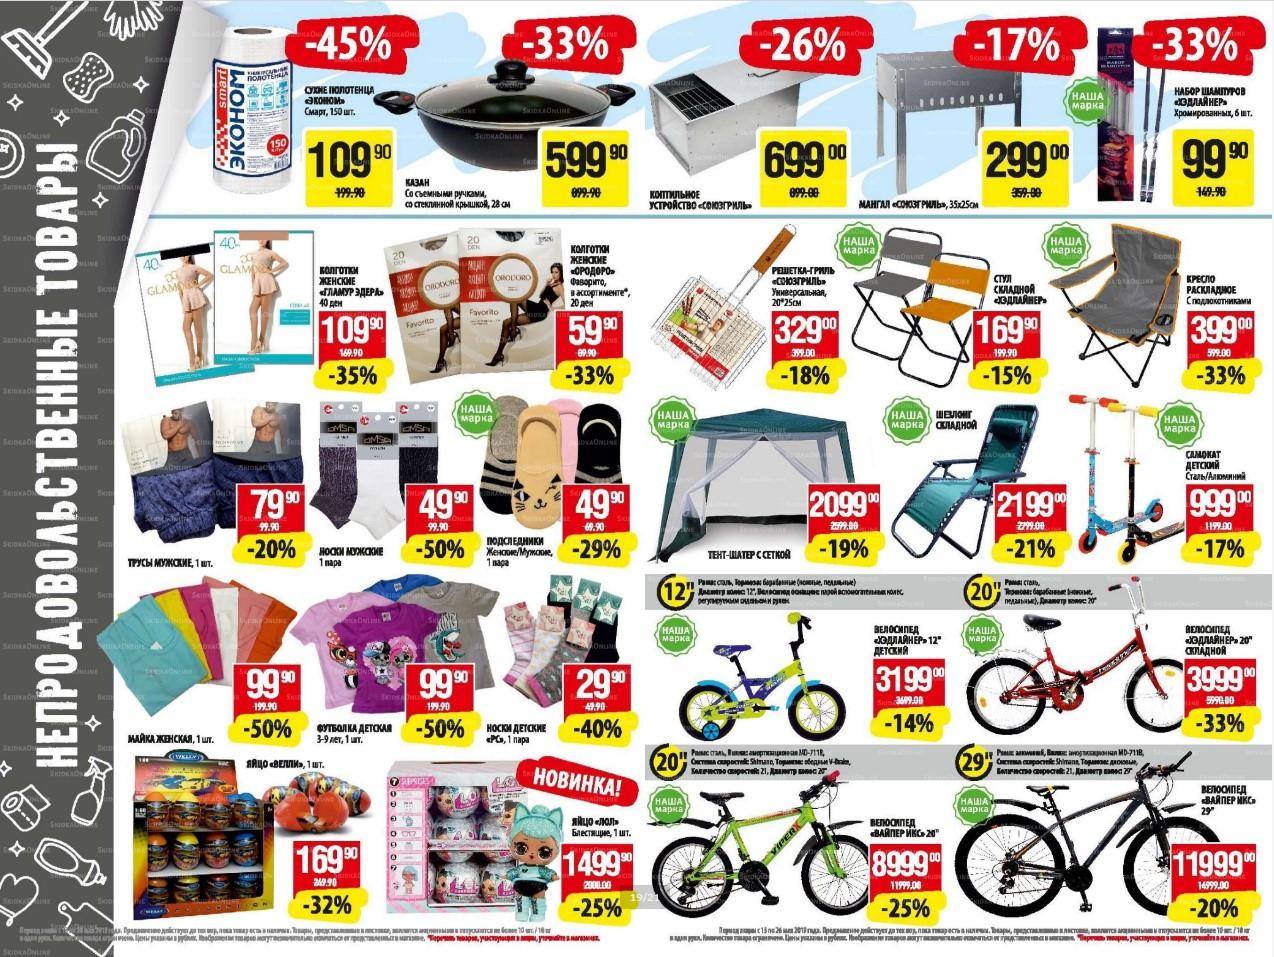 Каталог гипермаркетов Райт 13-26.05.2019 стр.10